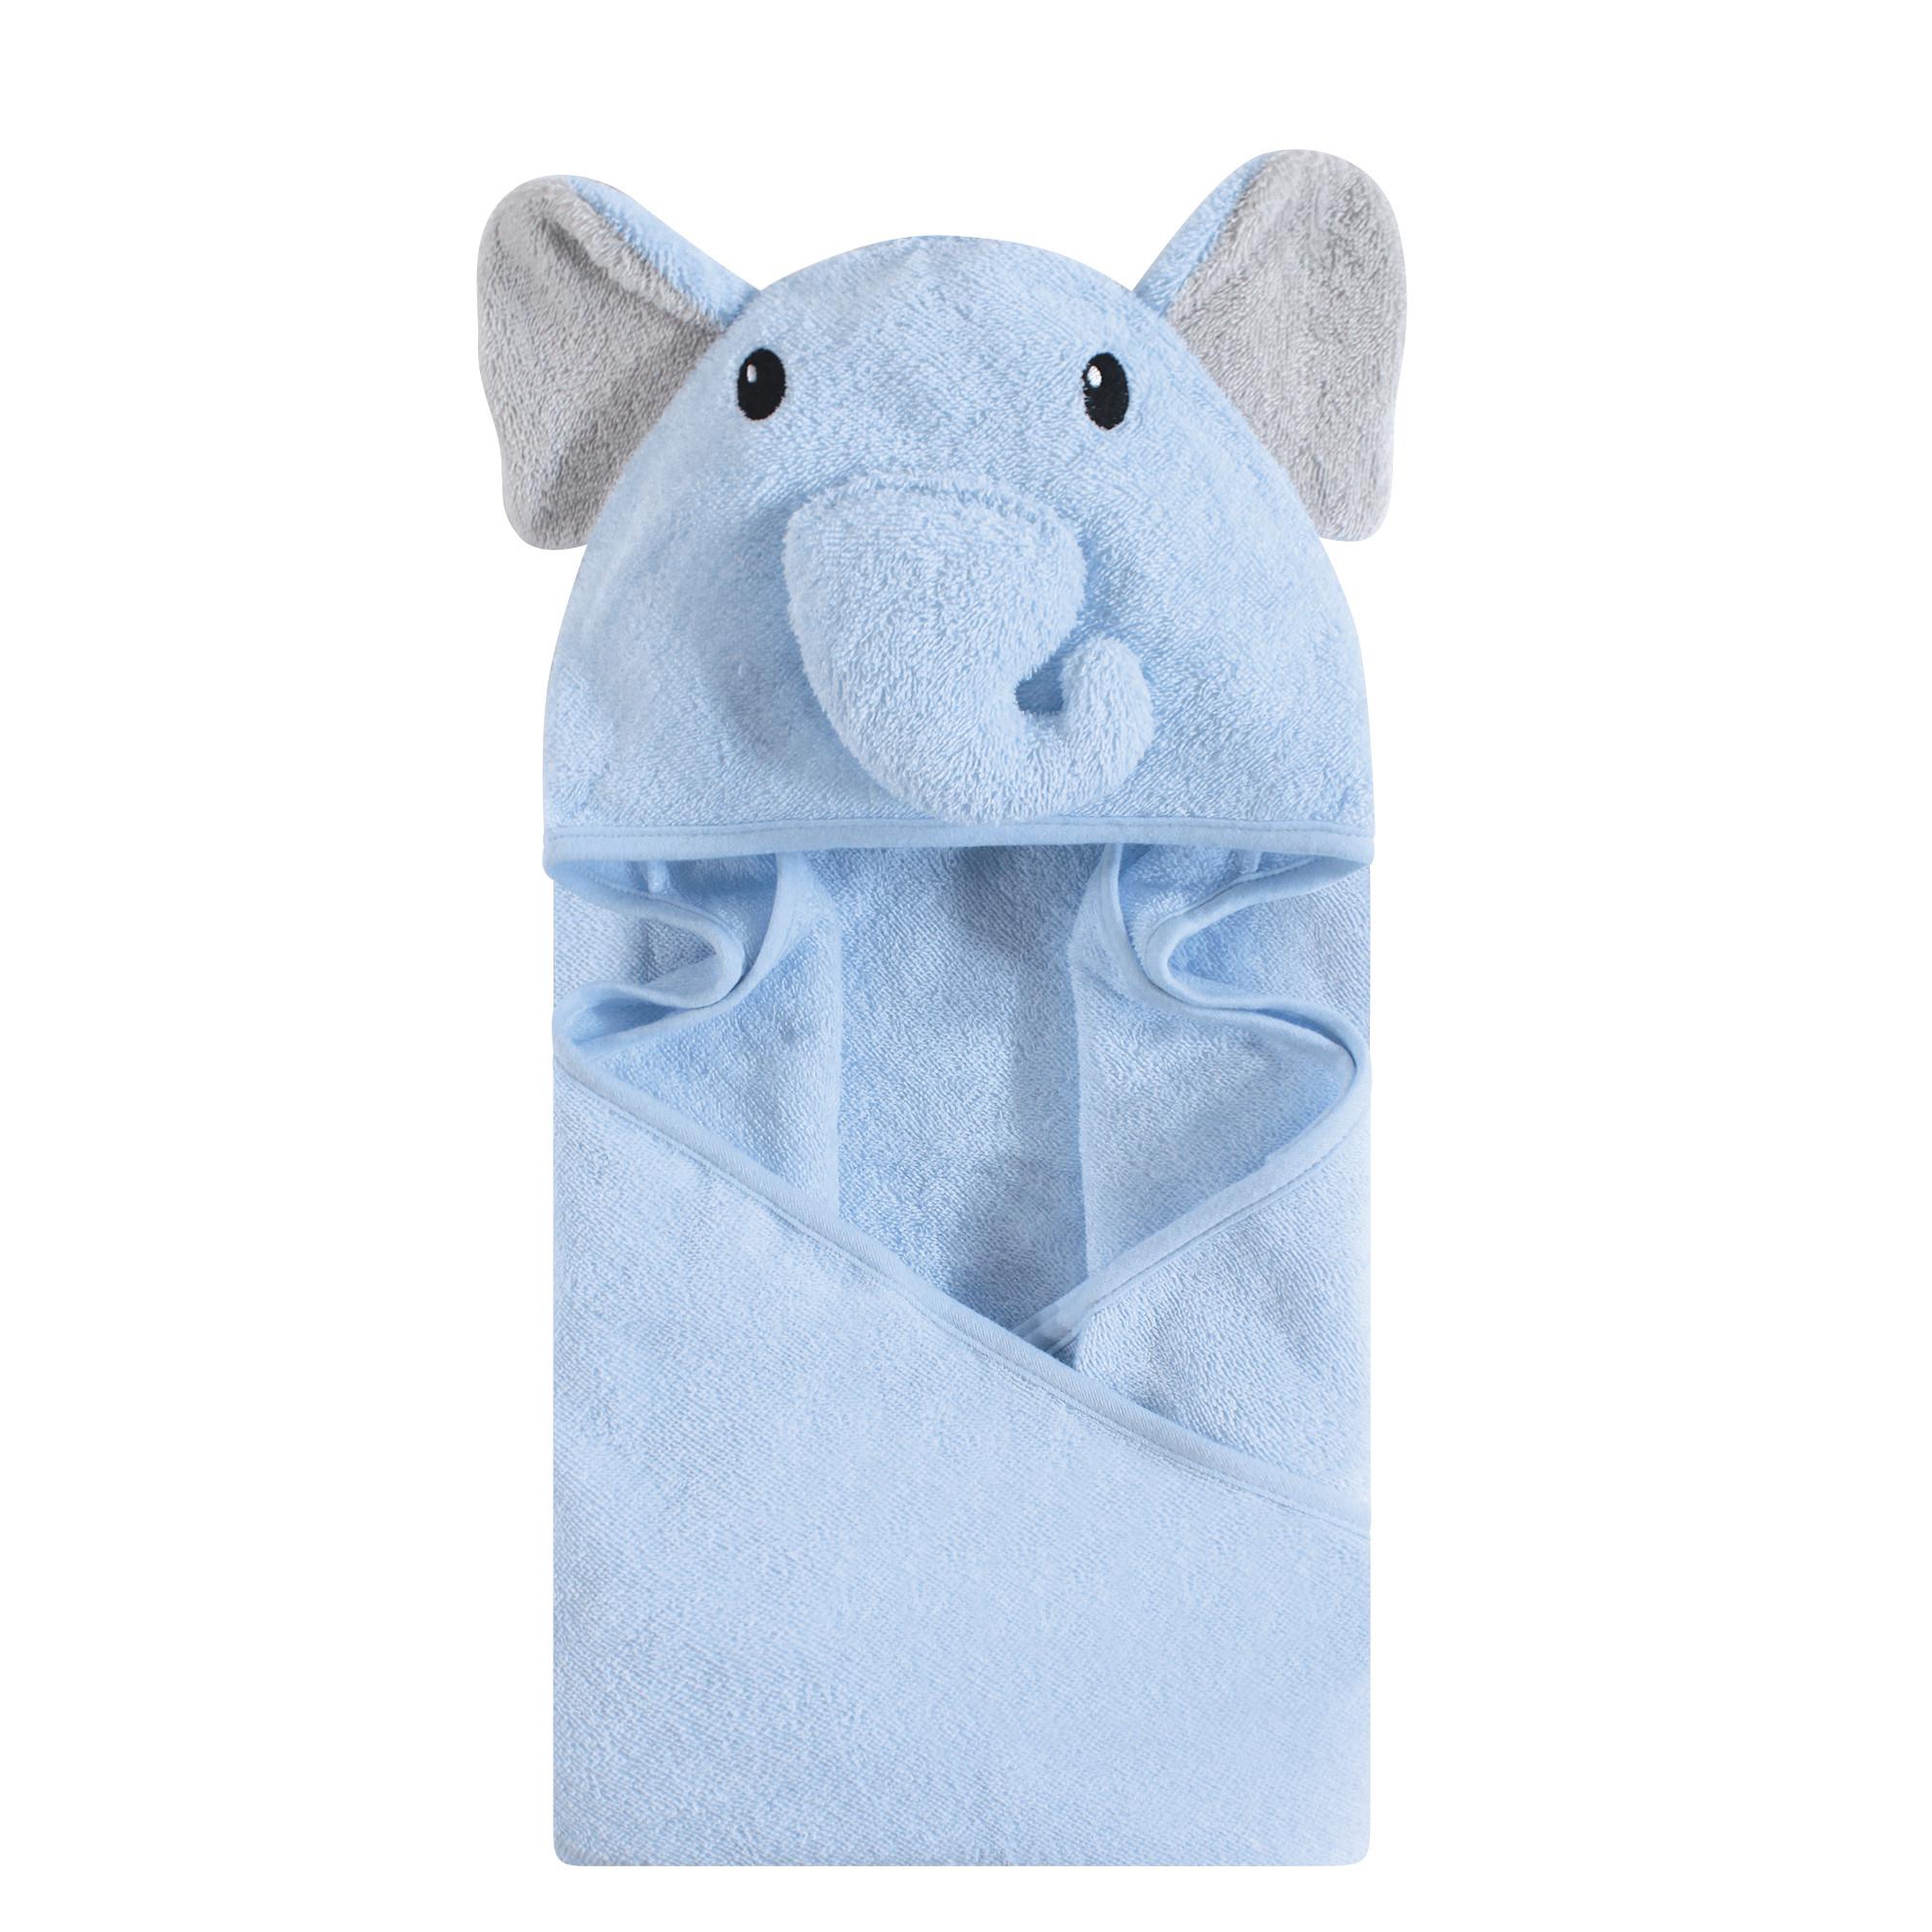 d8297e92fa2a Hudson Baby - Animal Face Hooded Towel, Blue Elephant   Affordable ...